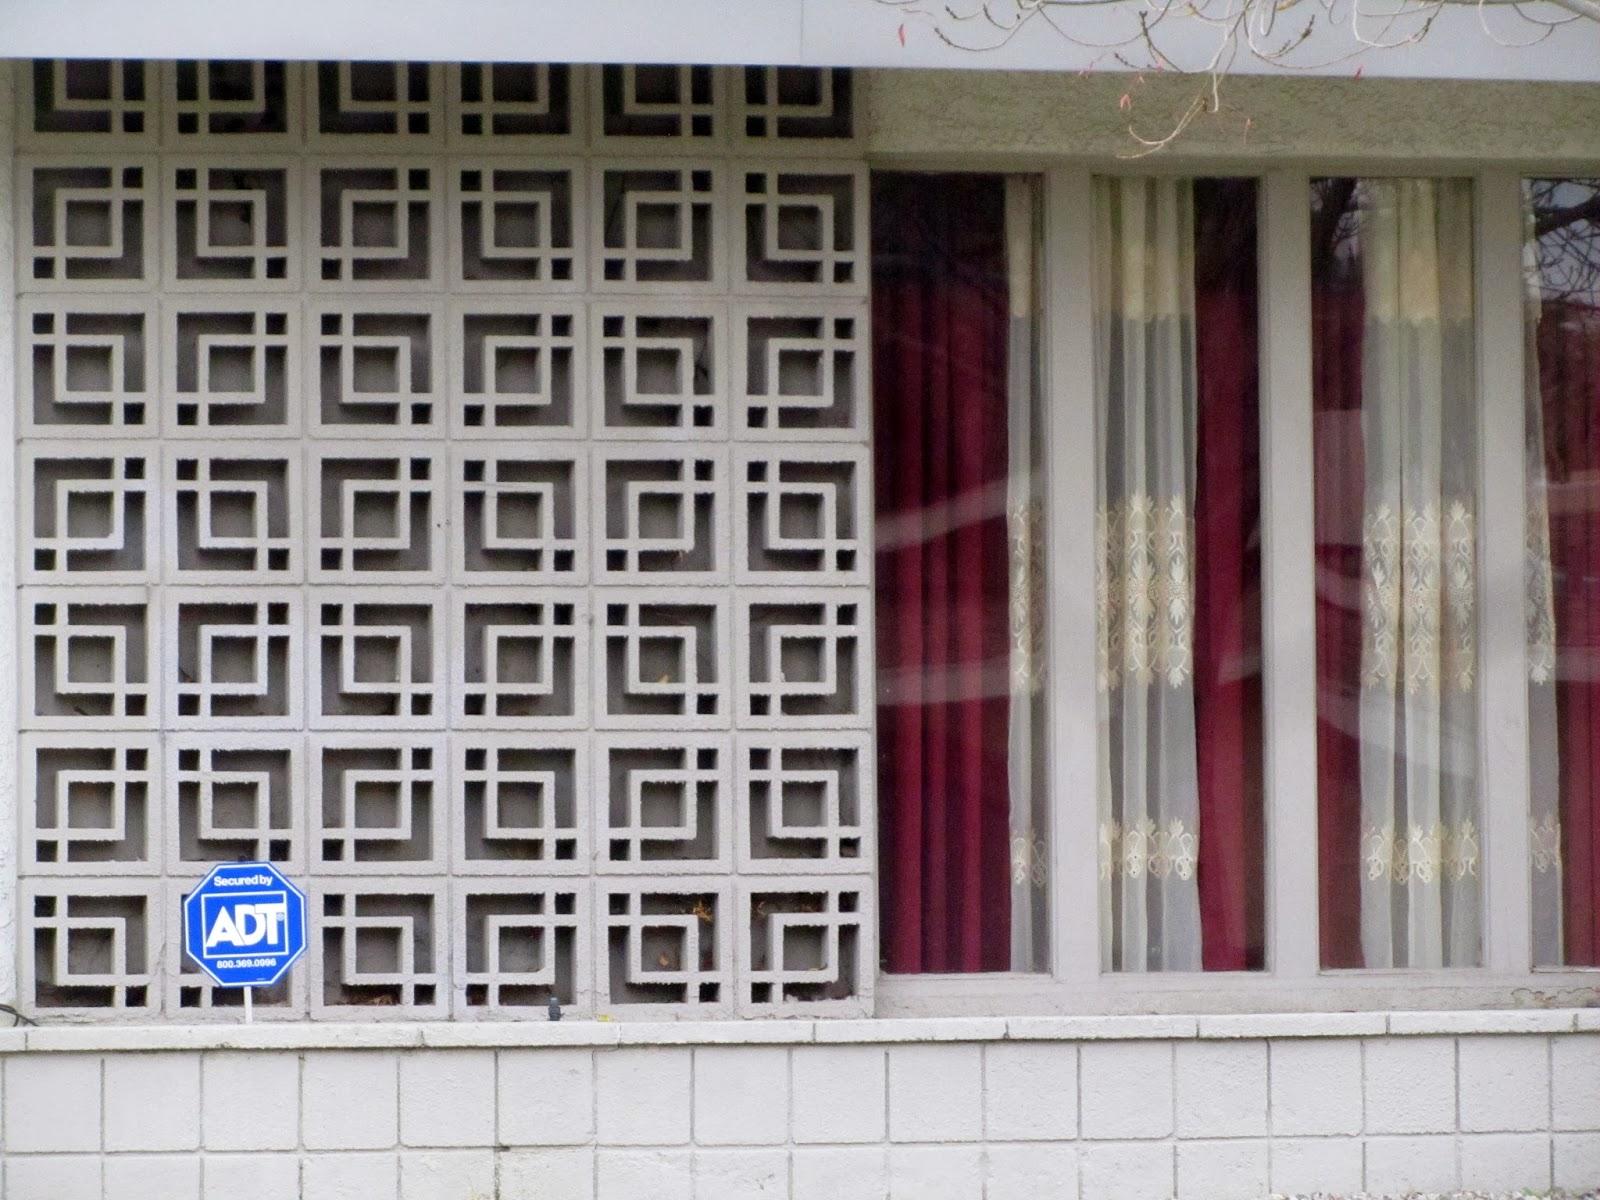 marr leonard wall liners block decor decorative forms concrete inc blocks collection